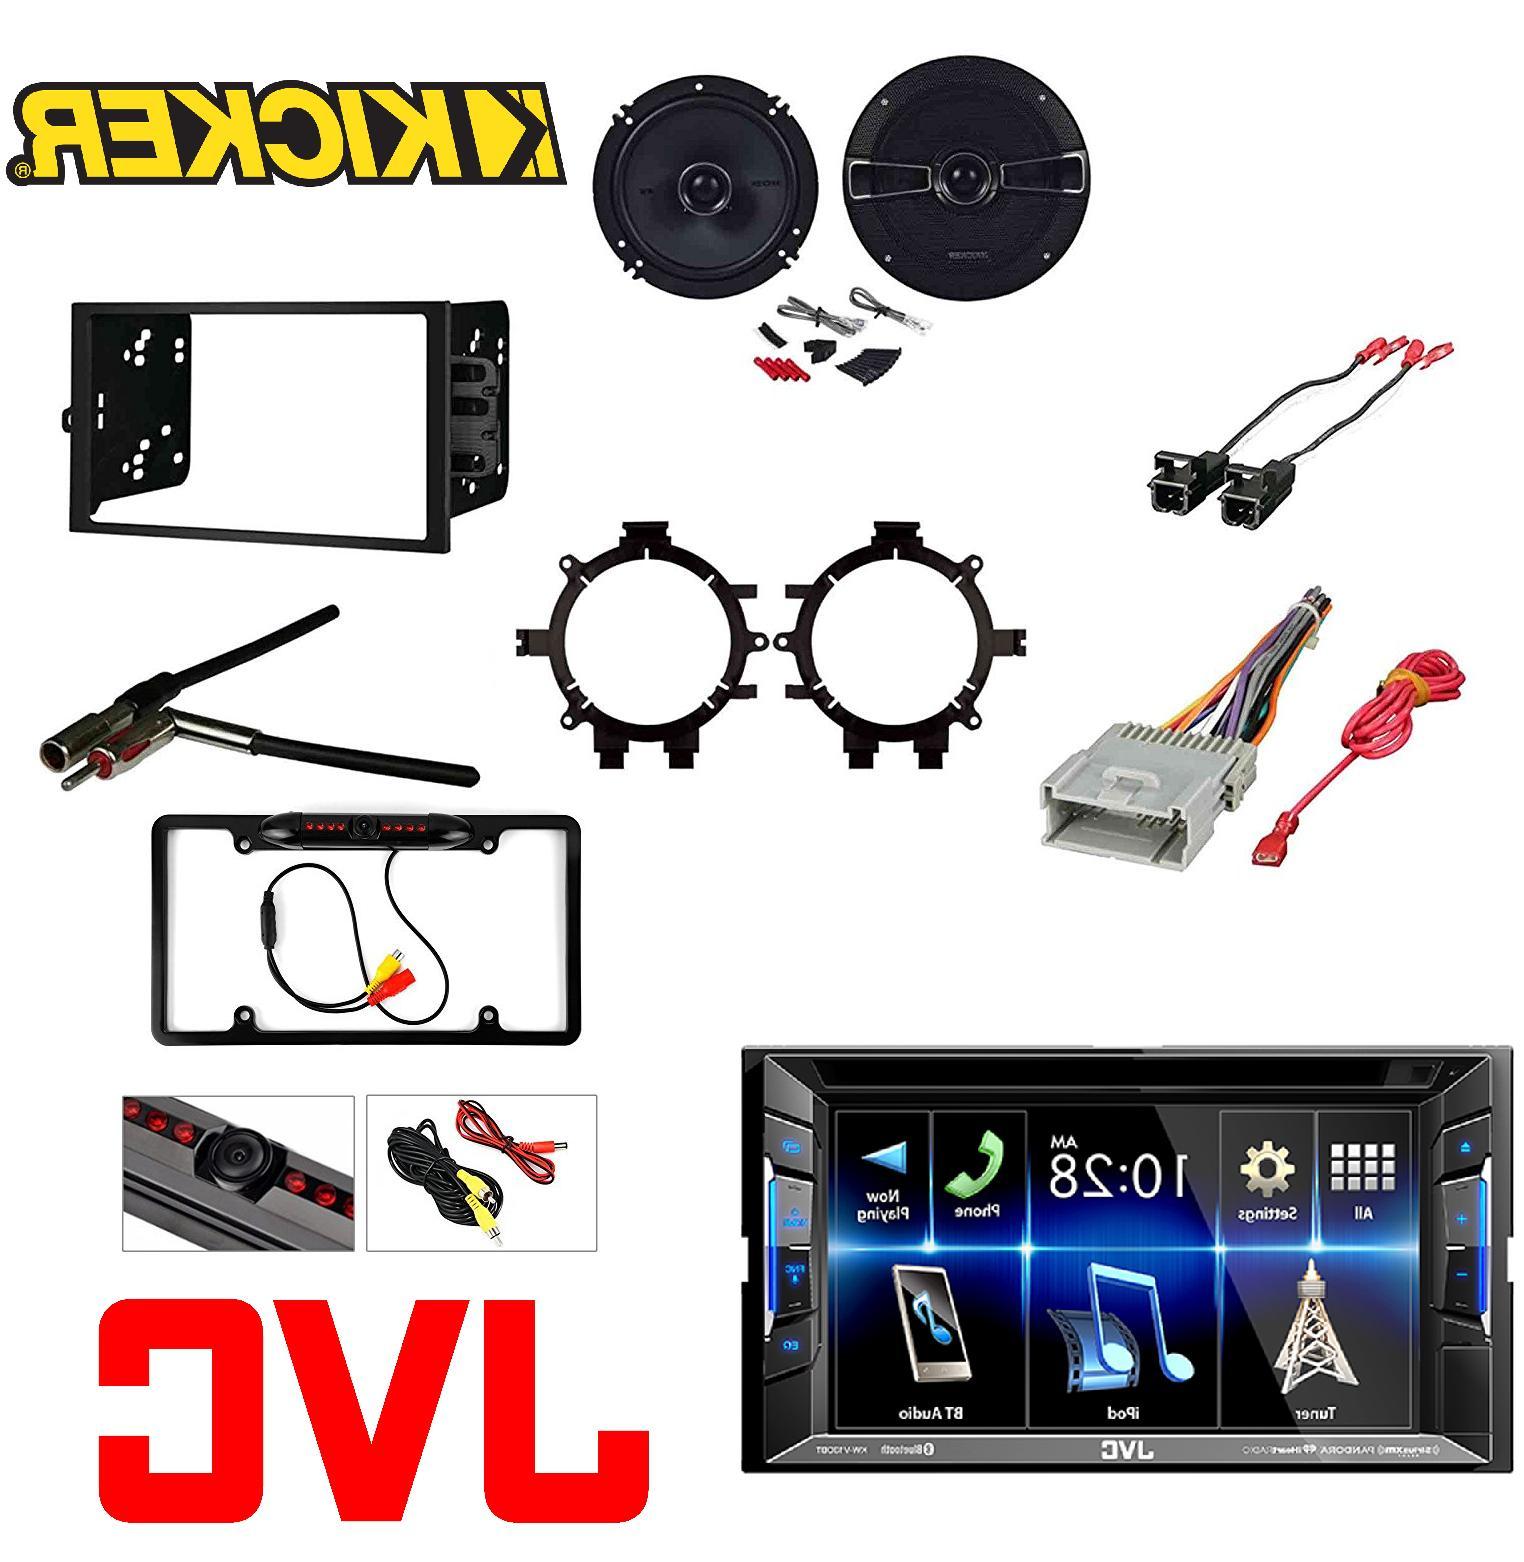 JVC Double Din DVD CD Player Car Radio Install Mount Kit Meg